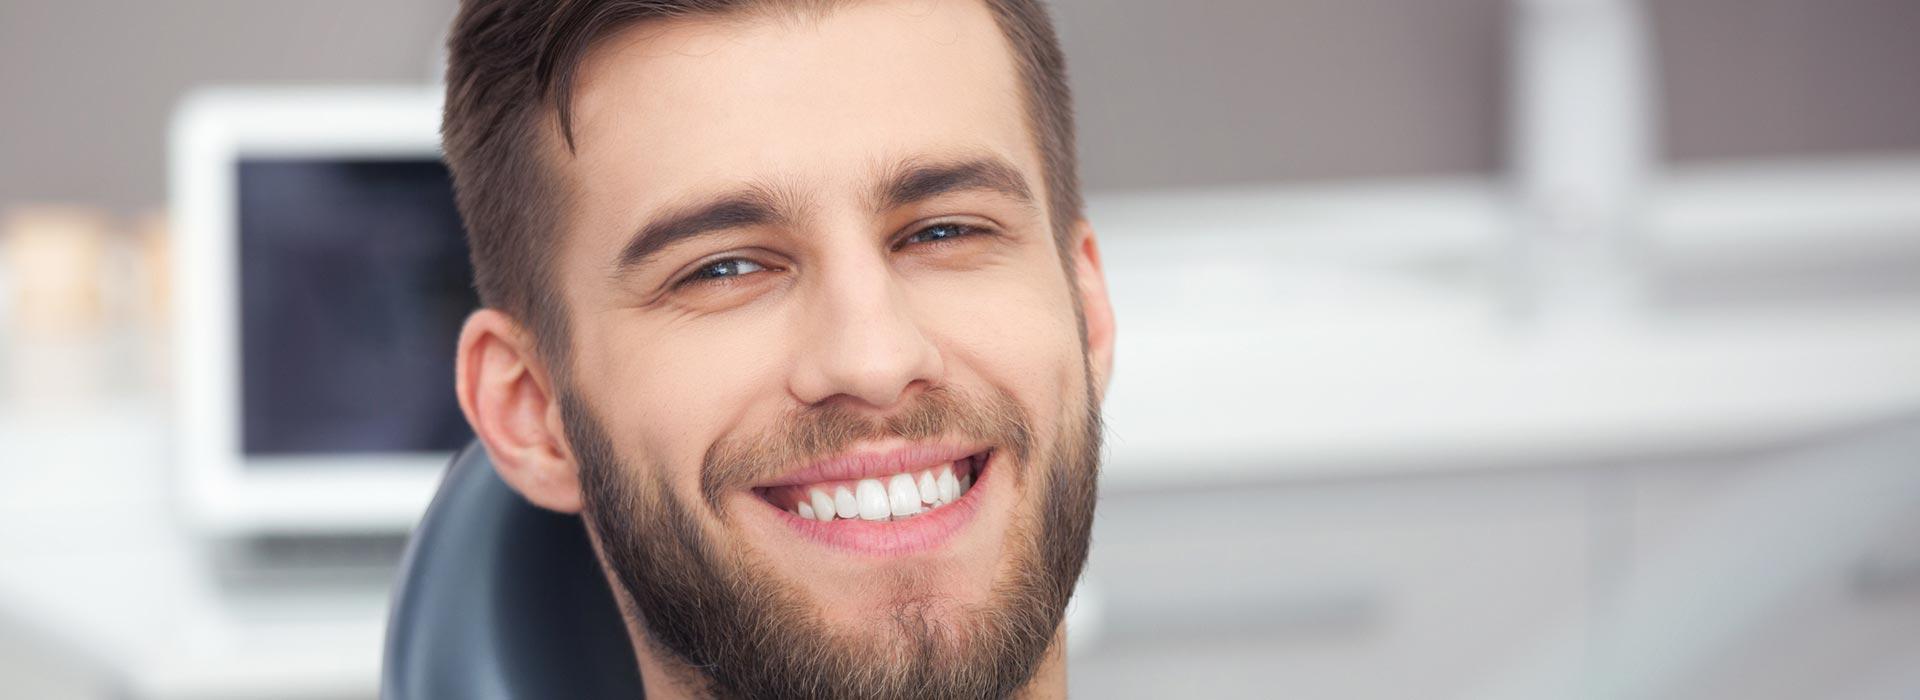 Happy man after having dental bonding treatment